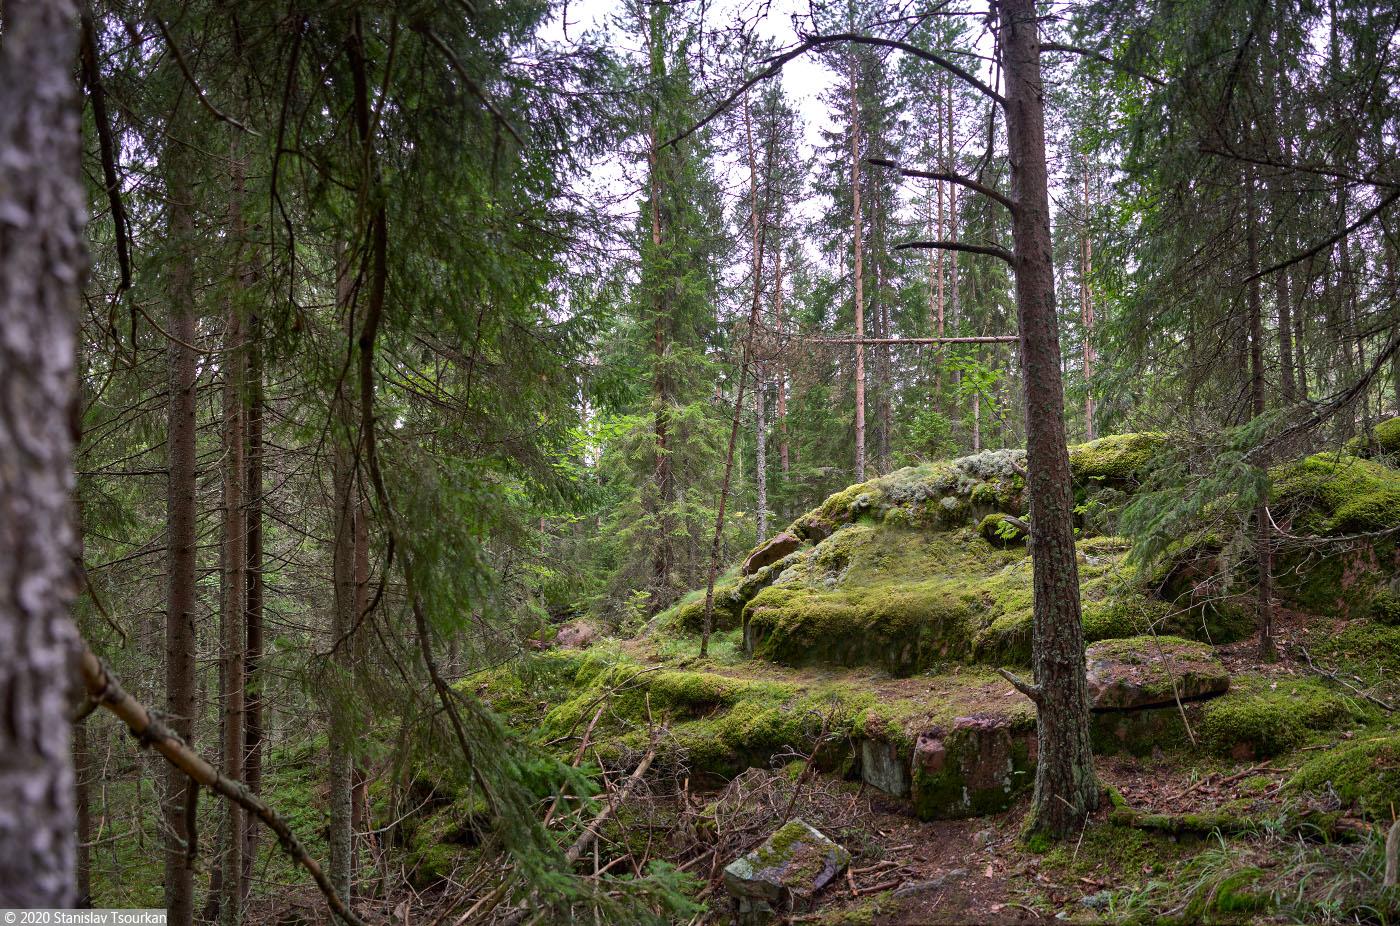 Карелия, республика Карелия, гора, Хийденвуори, пейзажи, природа